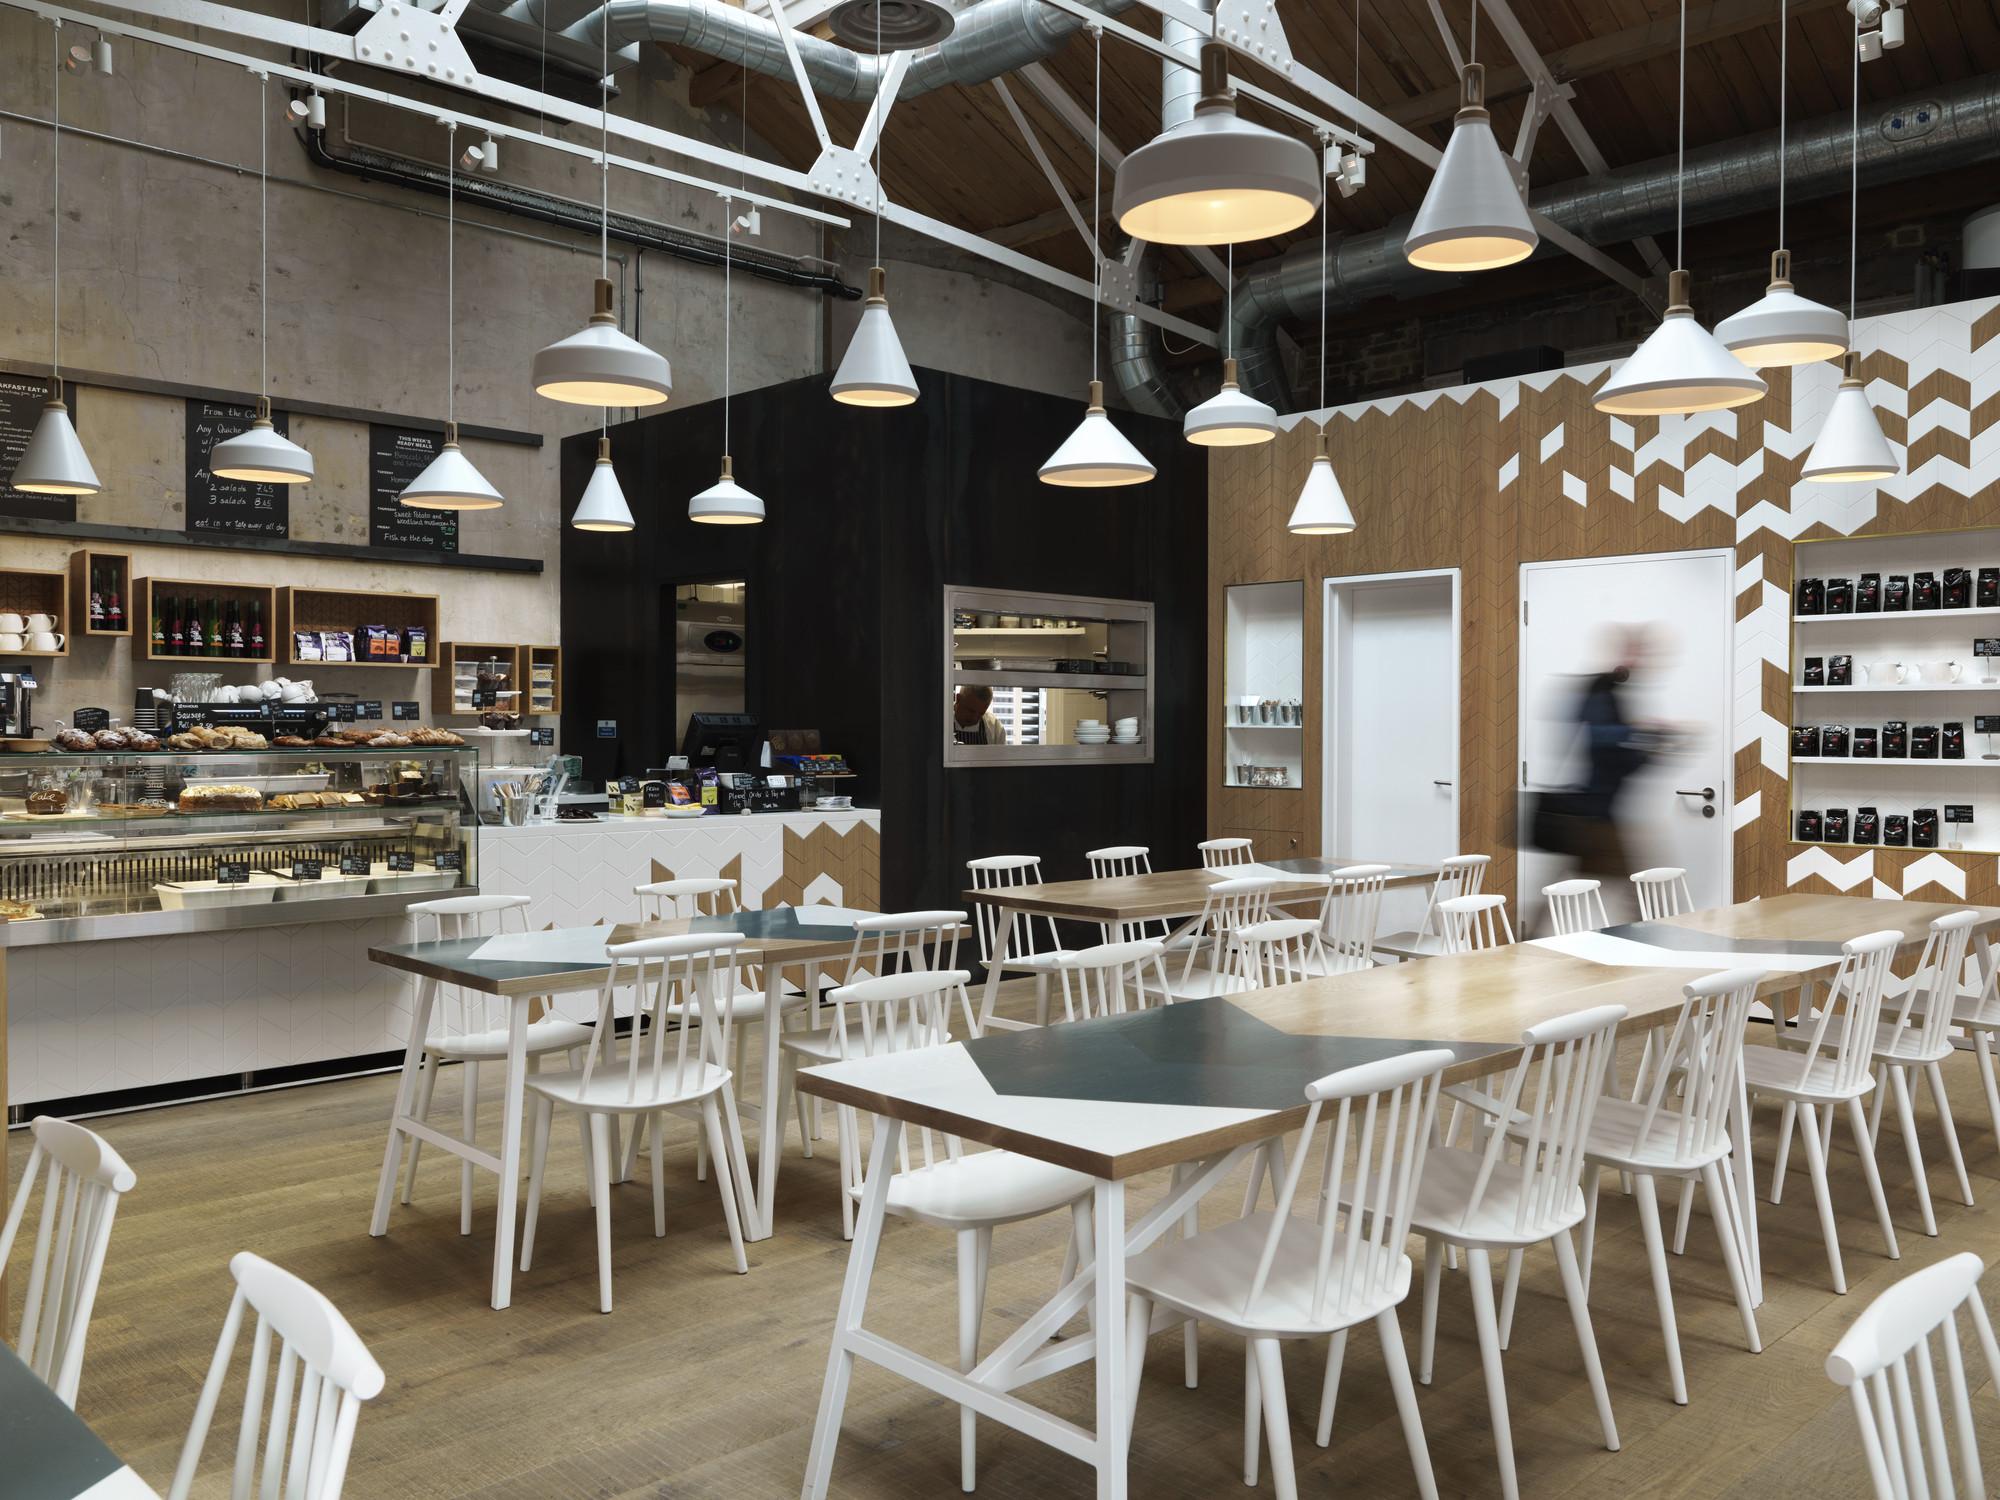 restaurant design fast/casual: cornerstone café (london) / paul crofts studio KTQAHPJ